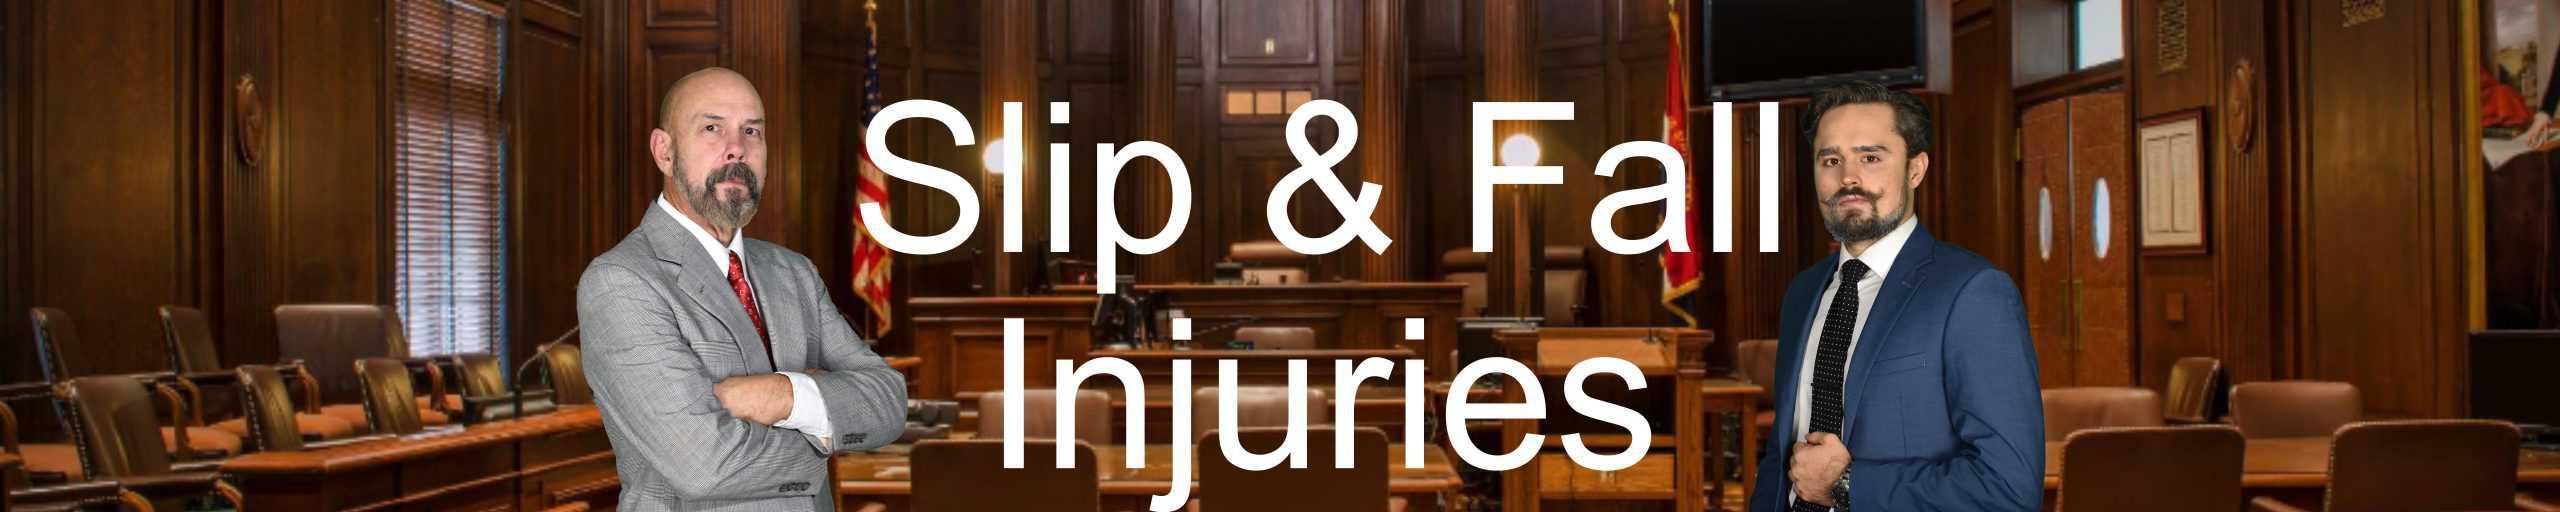 Slip-And-Fall-Injury-Injuries-Personal-Injury-Attorney-Lawyer-Liquid-Spill-Store-Broken-Fell-Head-Bleeding-Water-Coat-Hanger